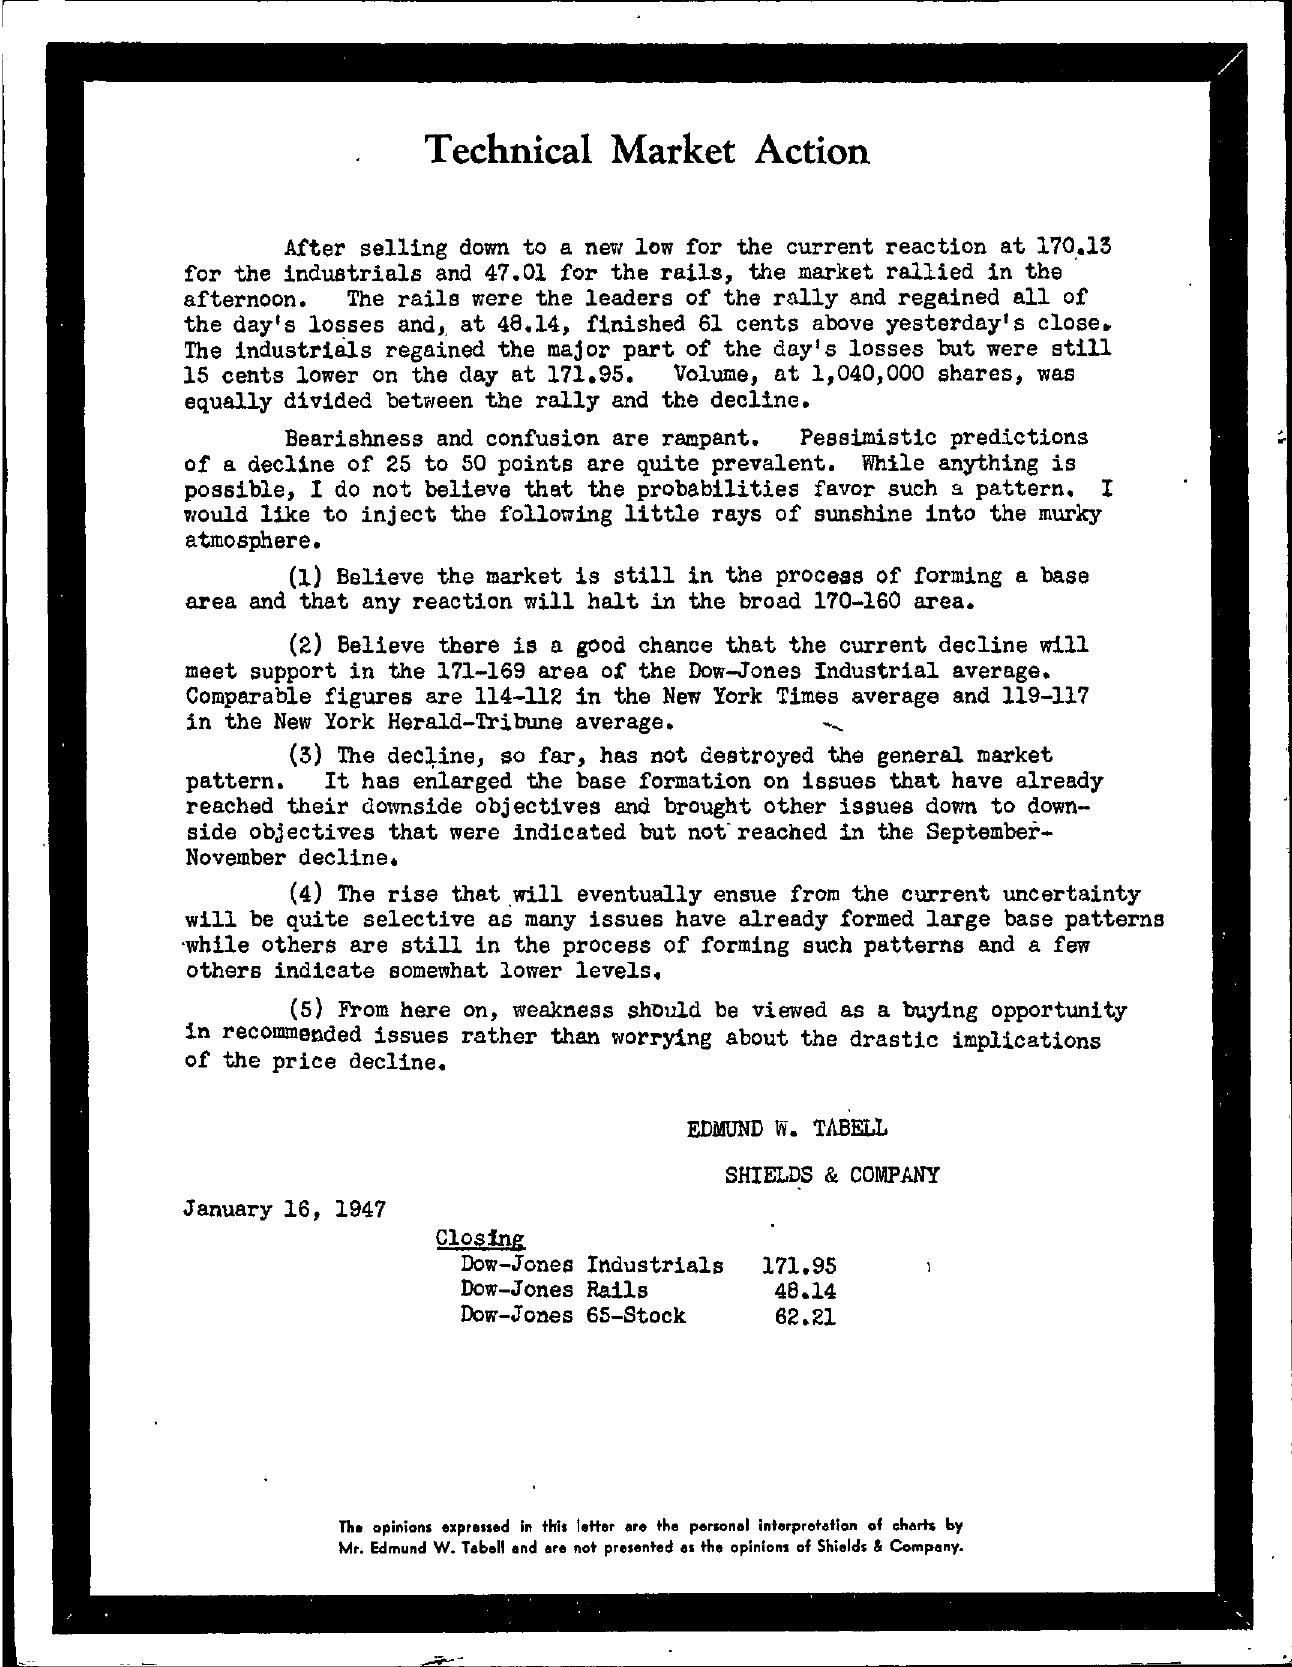 Tabell's Market Letter - January 16, 1947